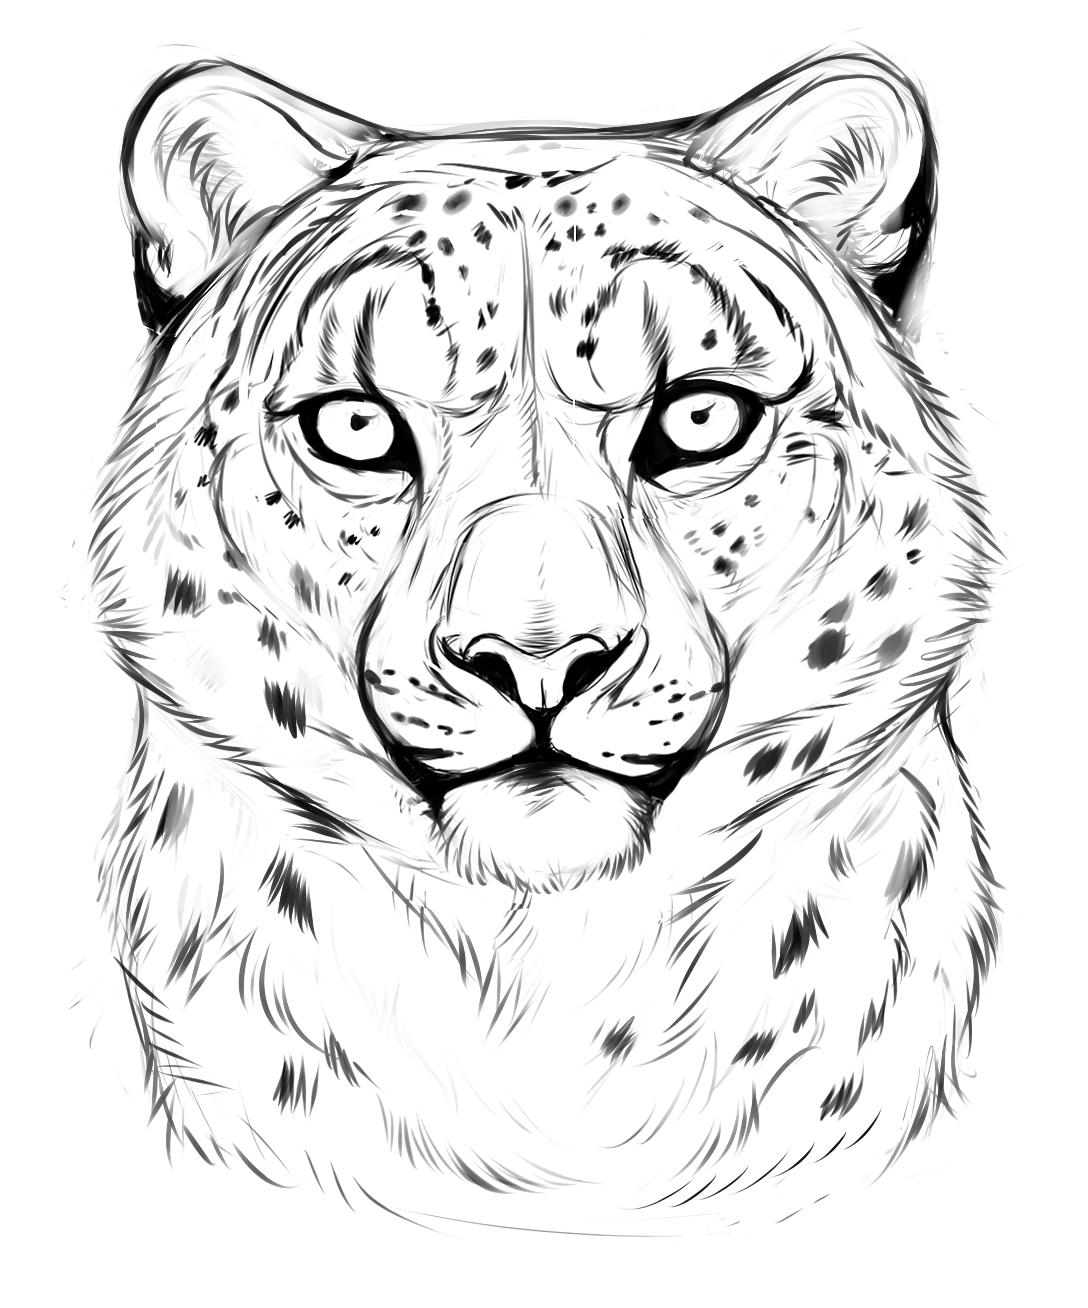 1088x1308 Snow Leopard Drawing Drawn Snow Leopard Sketch